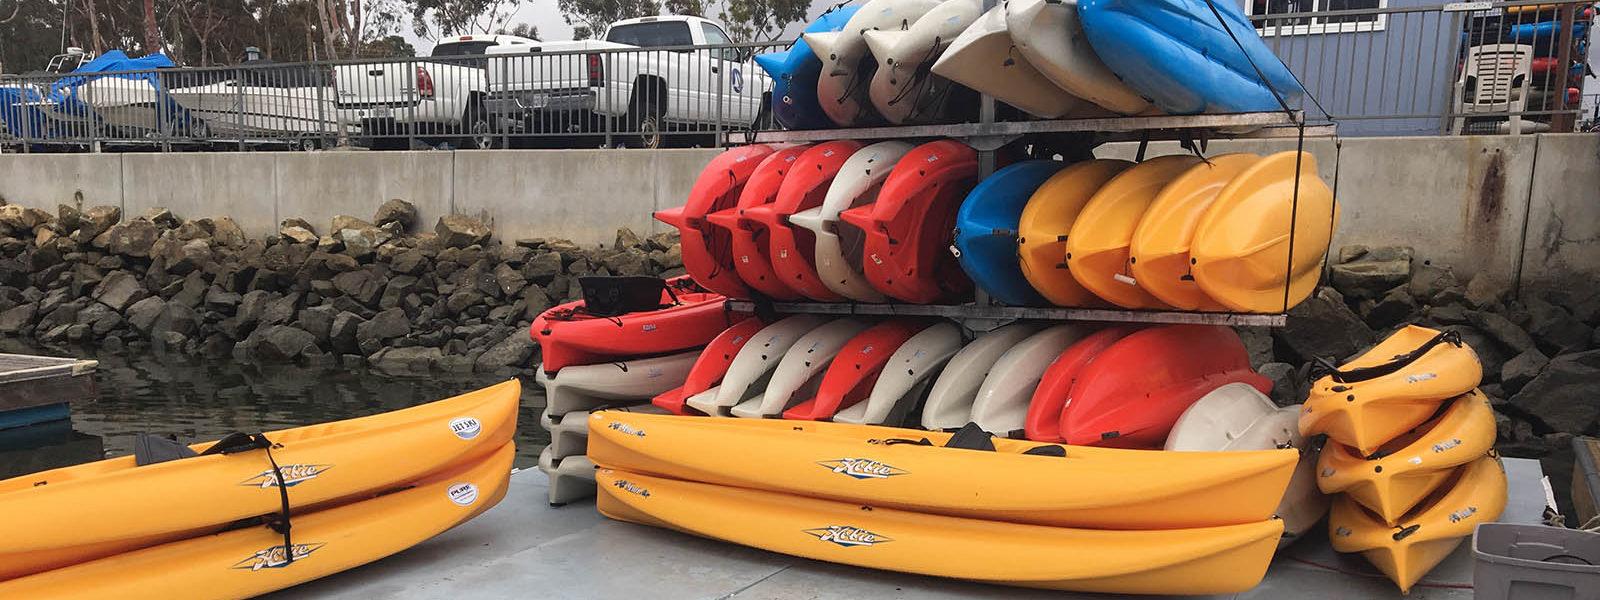 kayak_rental_header-1600x600.jpg